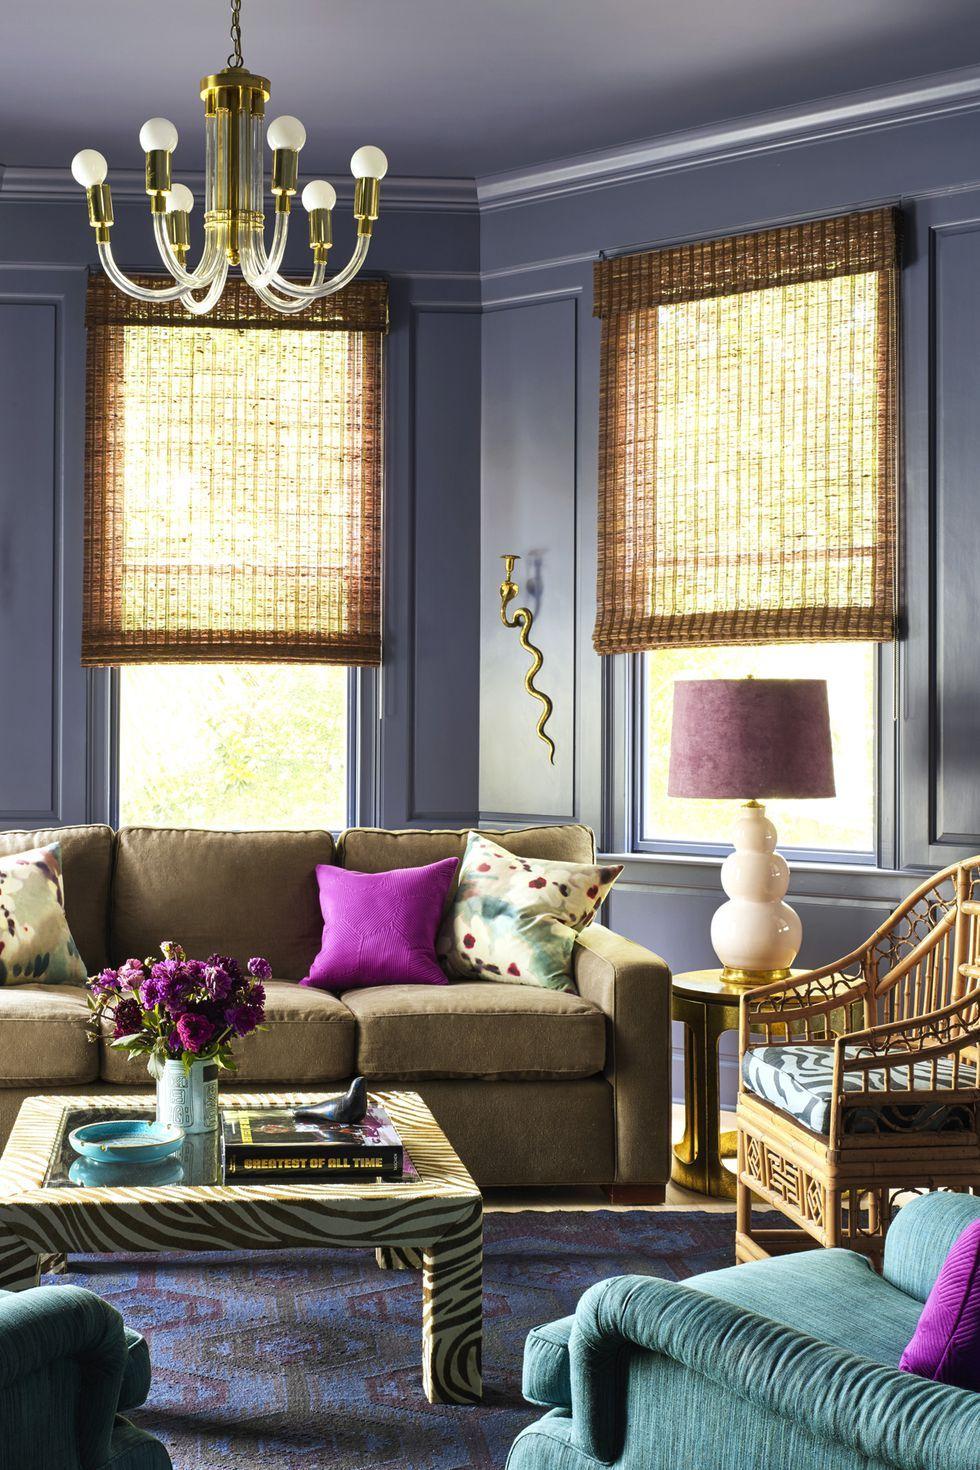 52 Best Interior Decorating Secrets Decorating Tips And Tricks